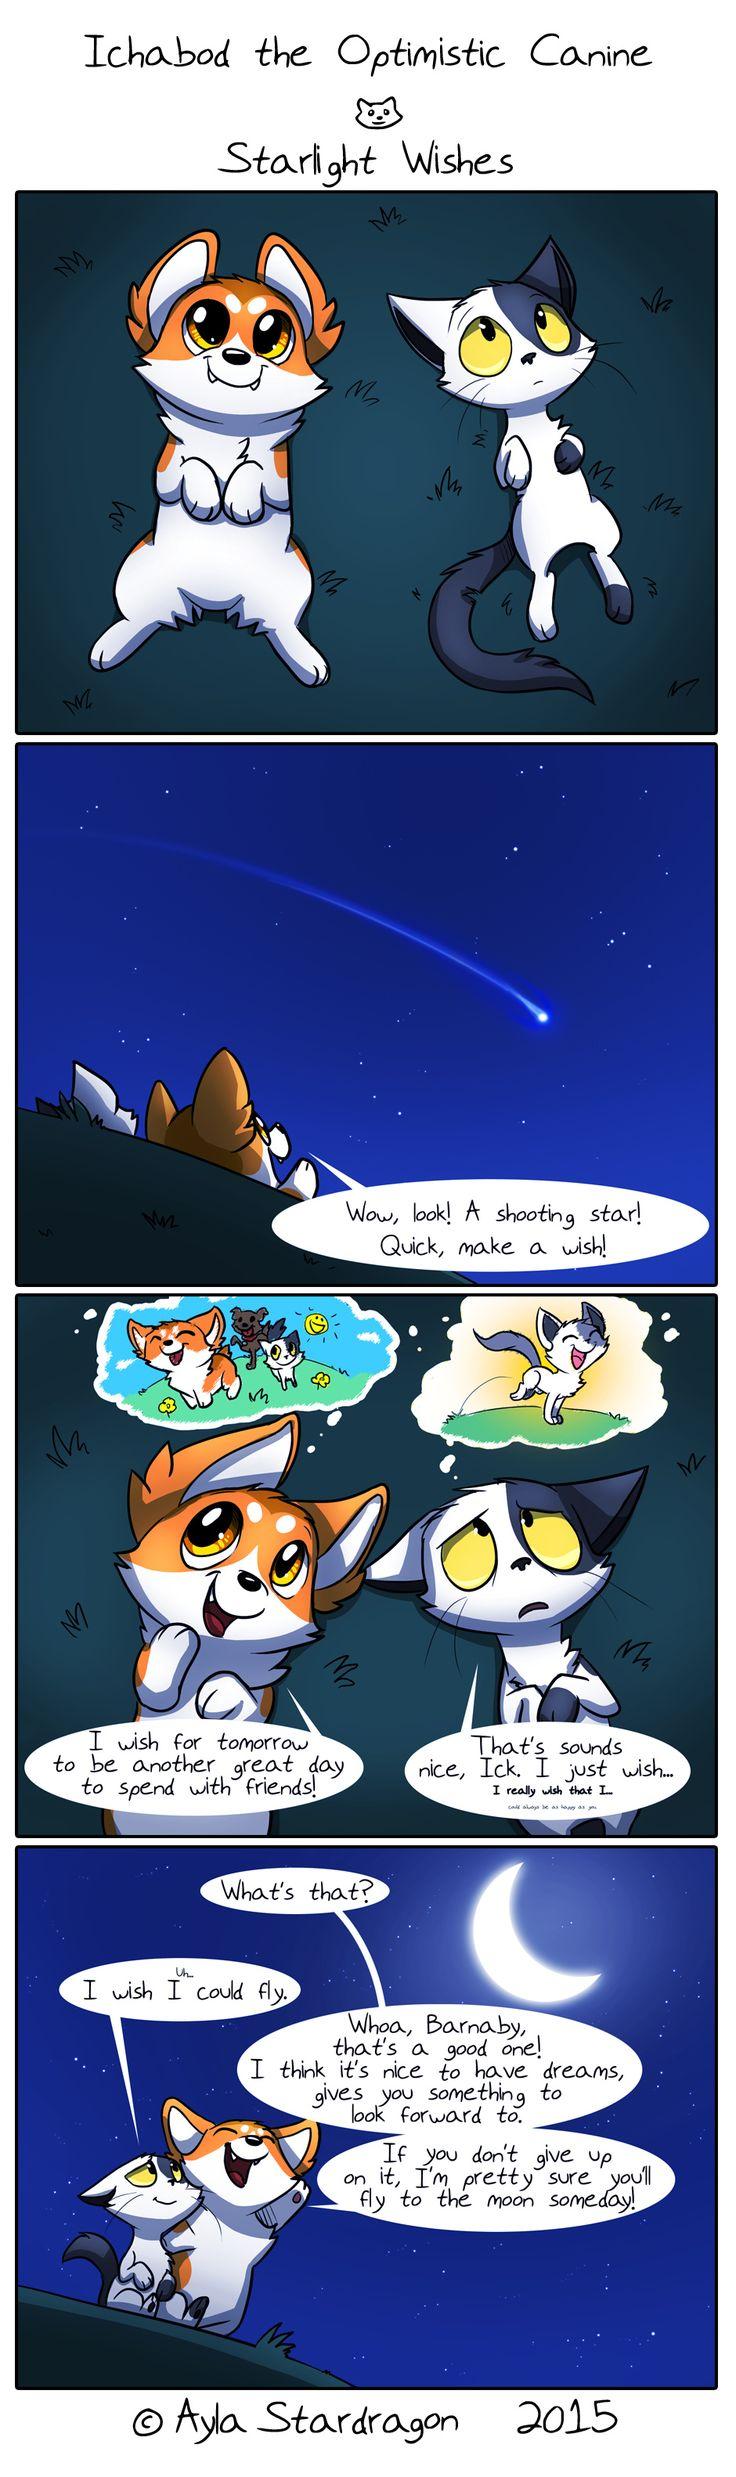 Ichabod the Optimistic Canine :: Starlight Wishes | Tapastic Comics - image 1